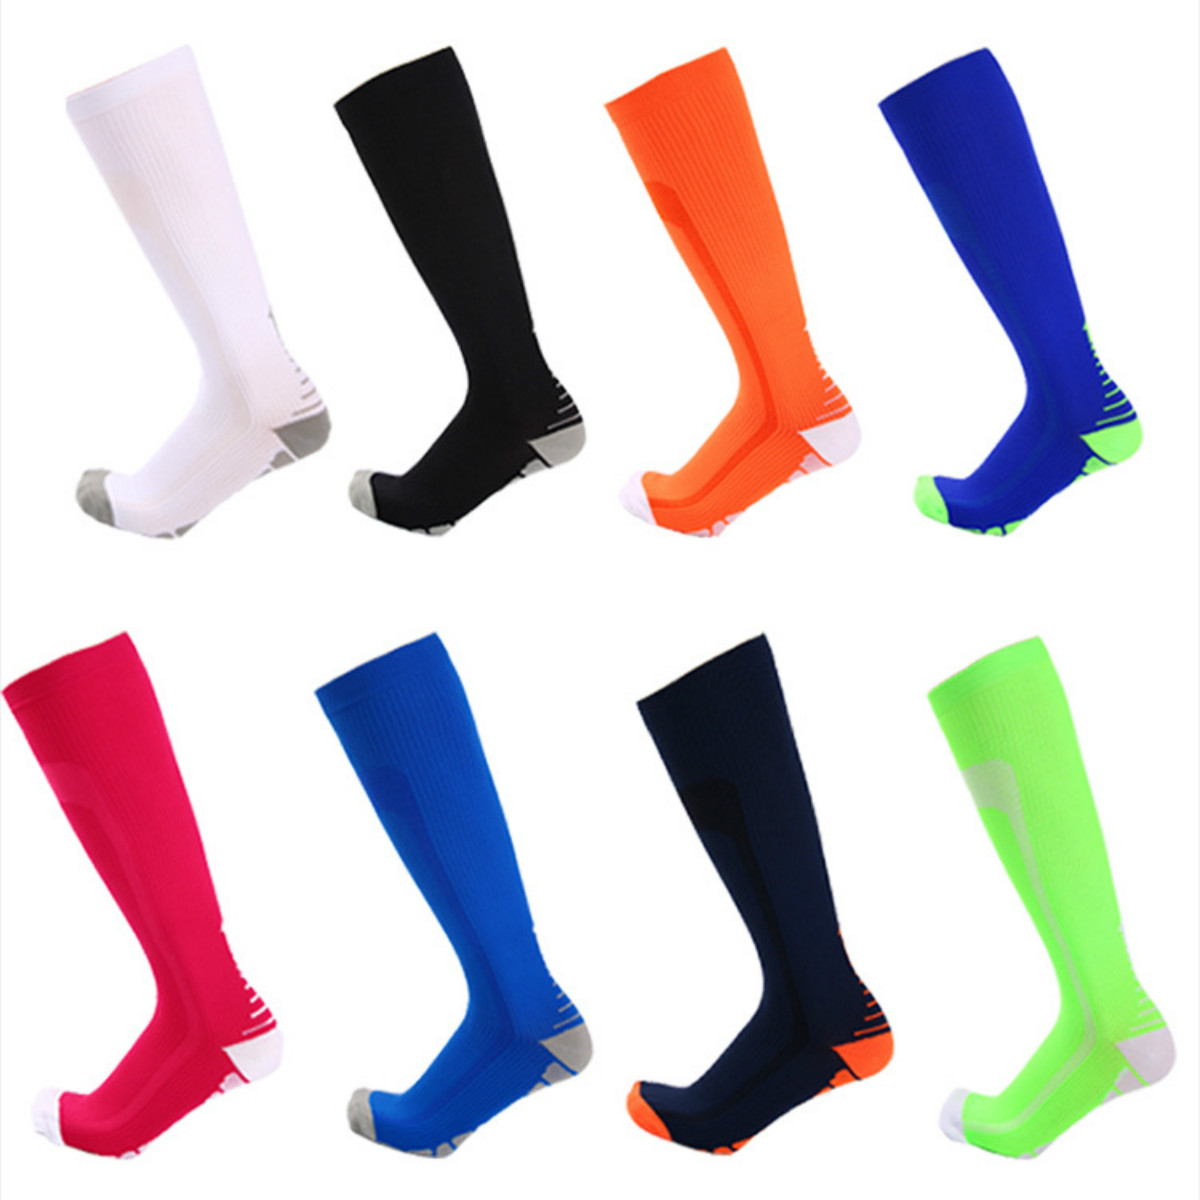 Straightforward Compression Socks Unisex Anti-fatigue Compression Socks Foot Pain Relief Soft Magic Socks Men Women Leg Support Dropshipping Hot Men's Socks